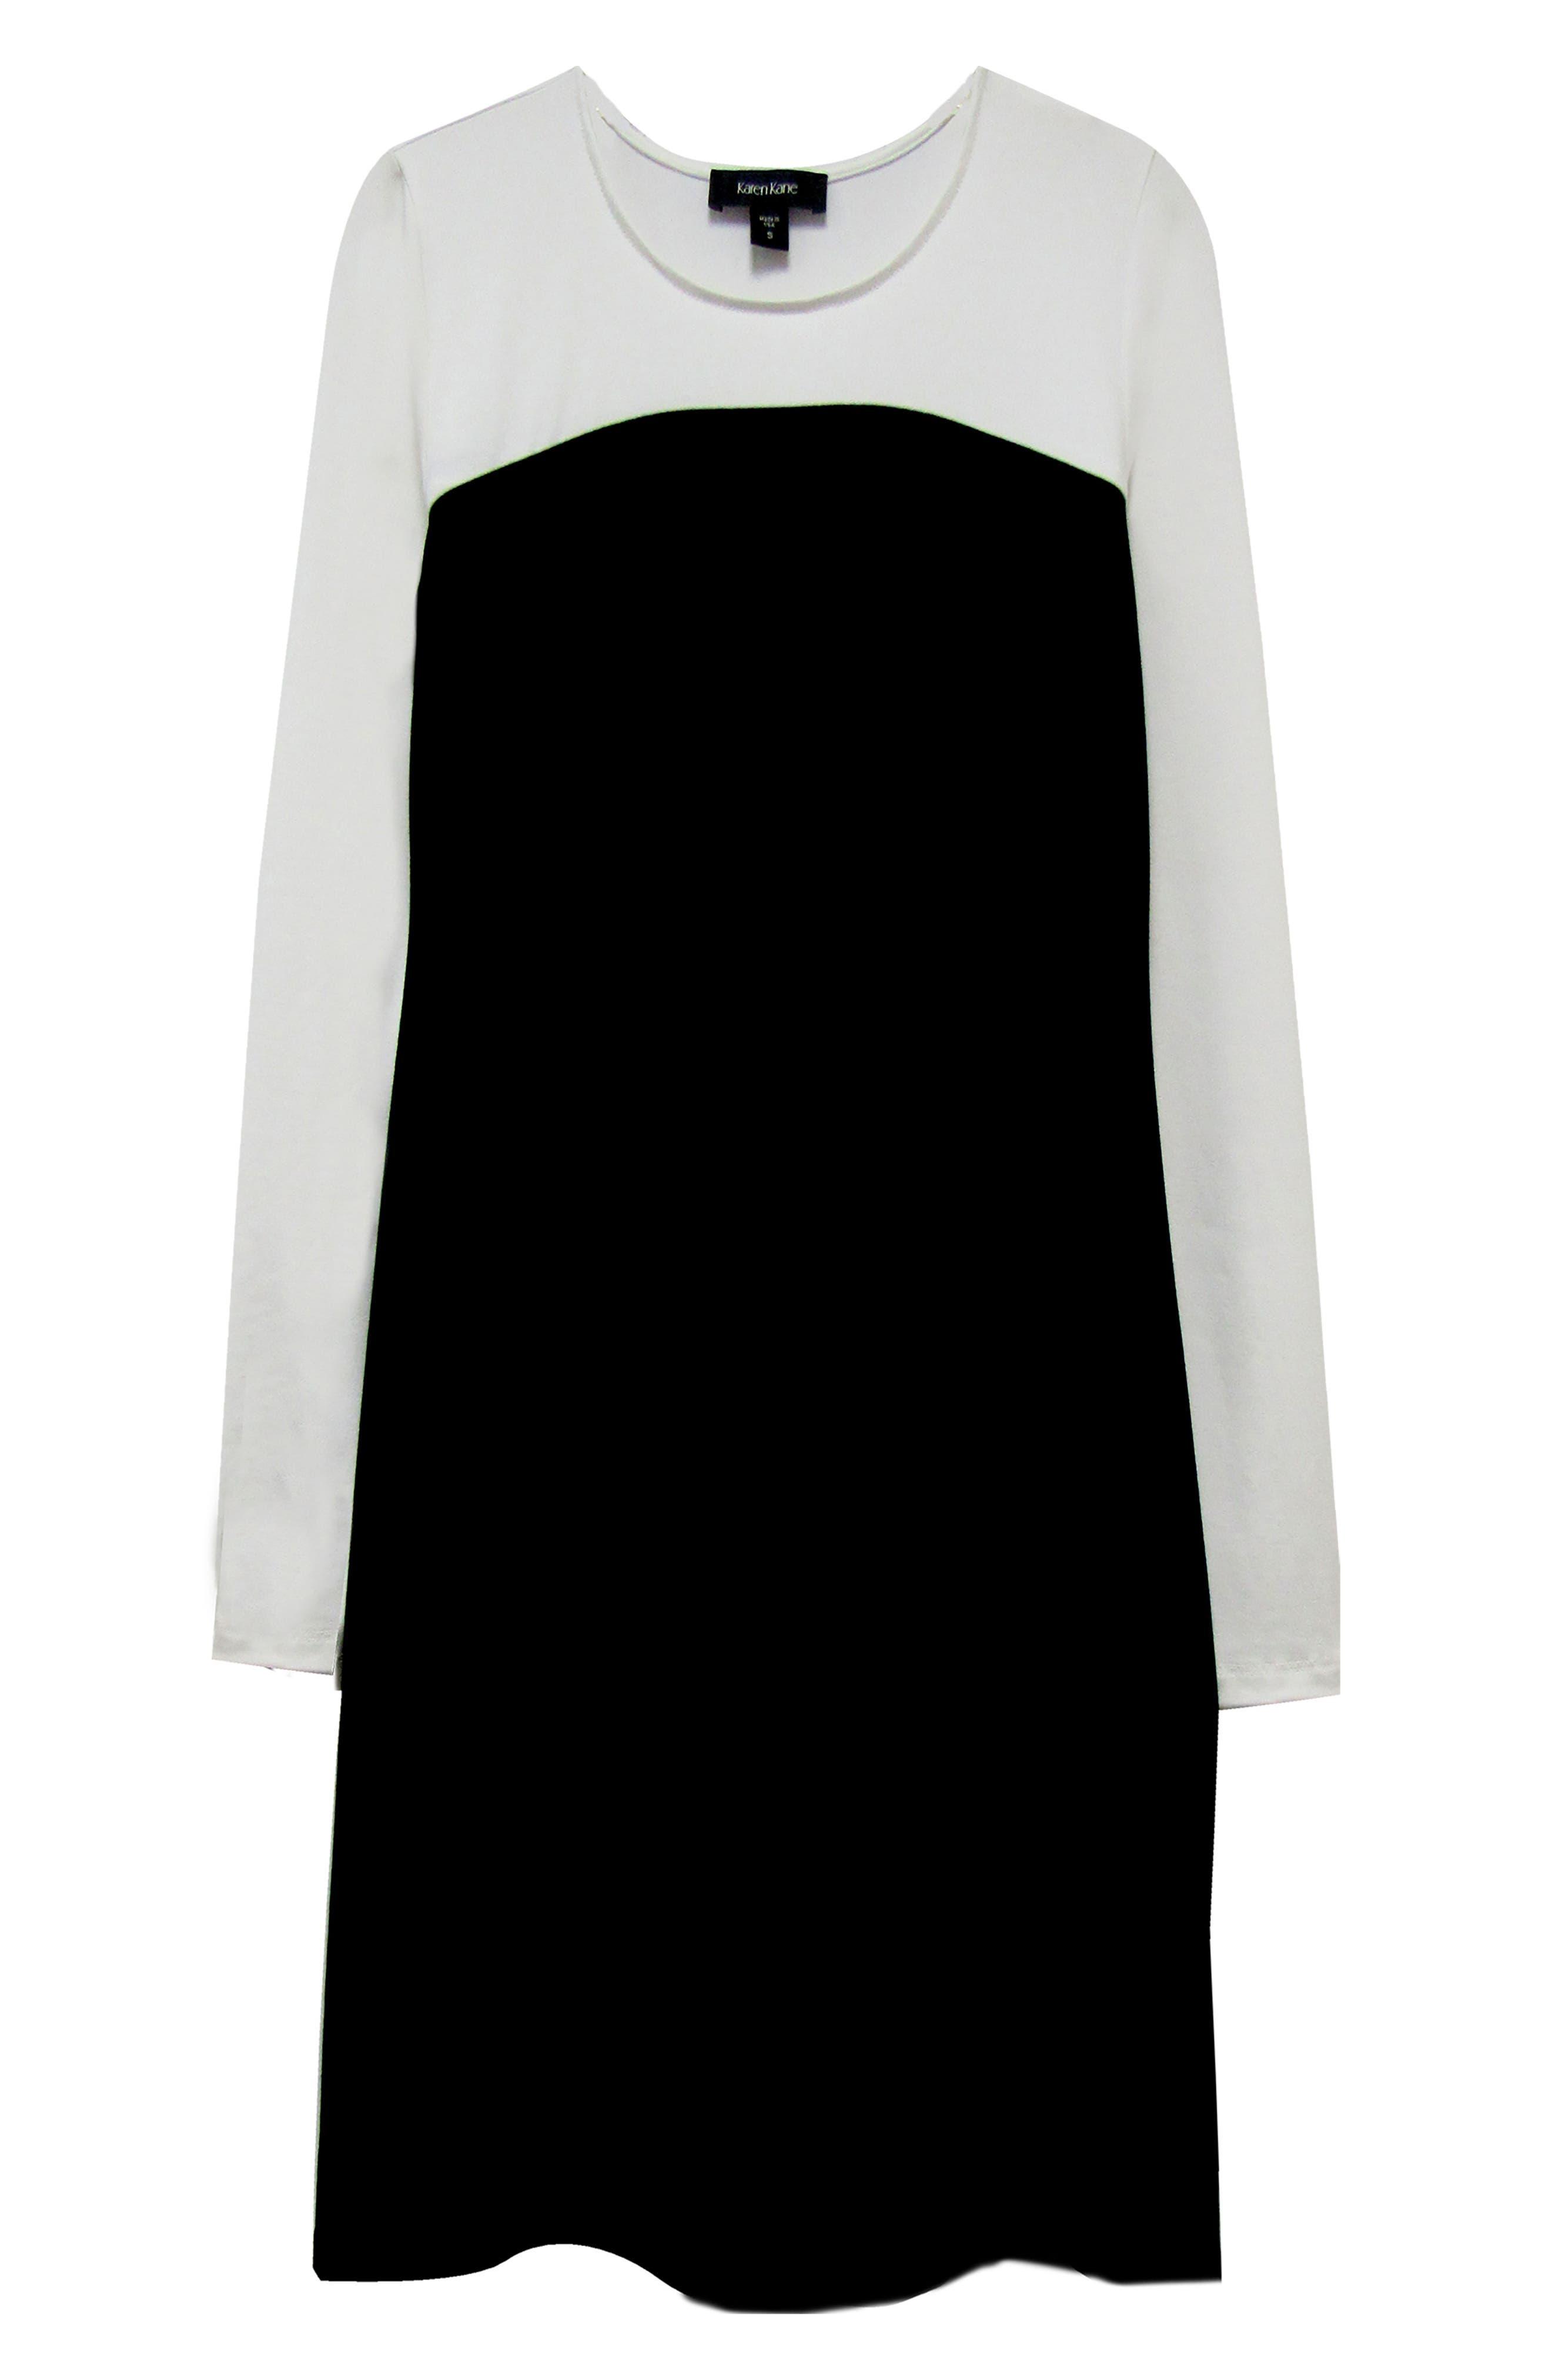 KAREN KANE, Colorblock Sheath Dress, Alternate thumbnail 3, color, BLACK WITH OFF WHITE